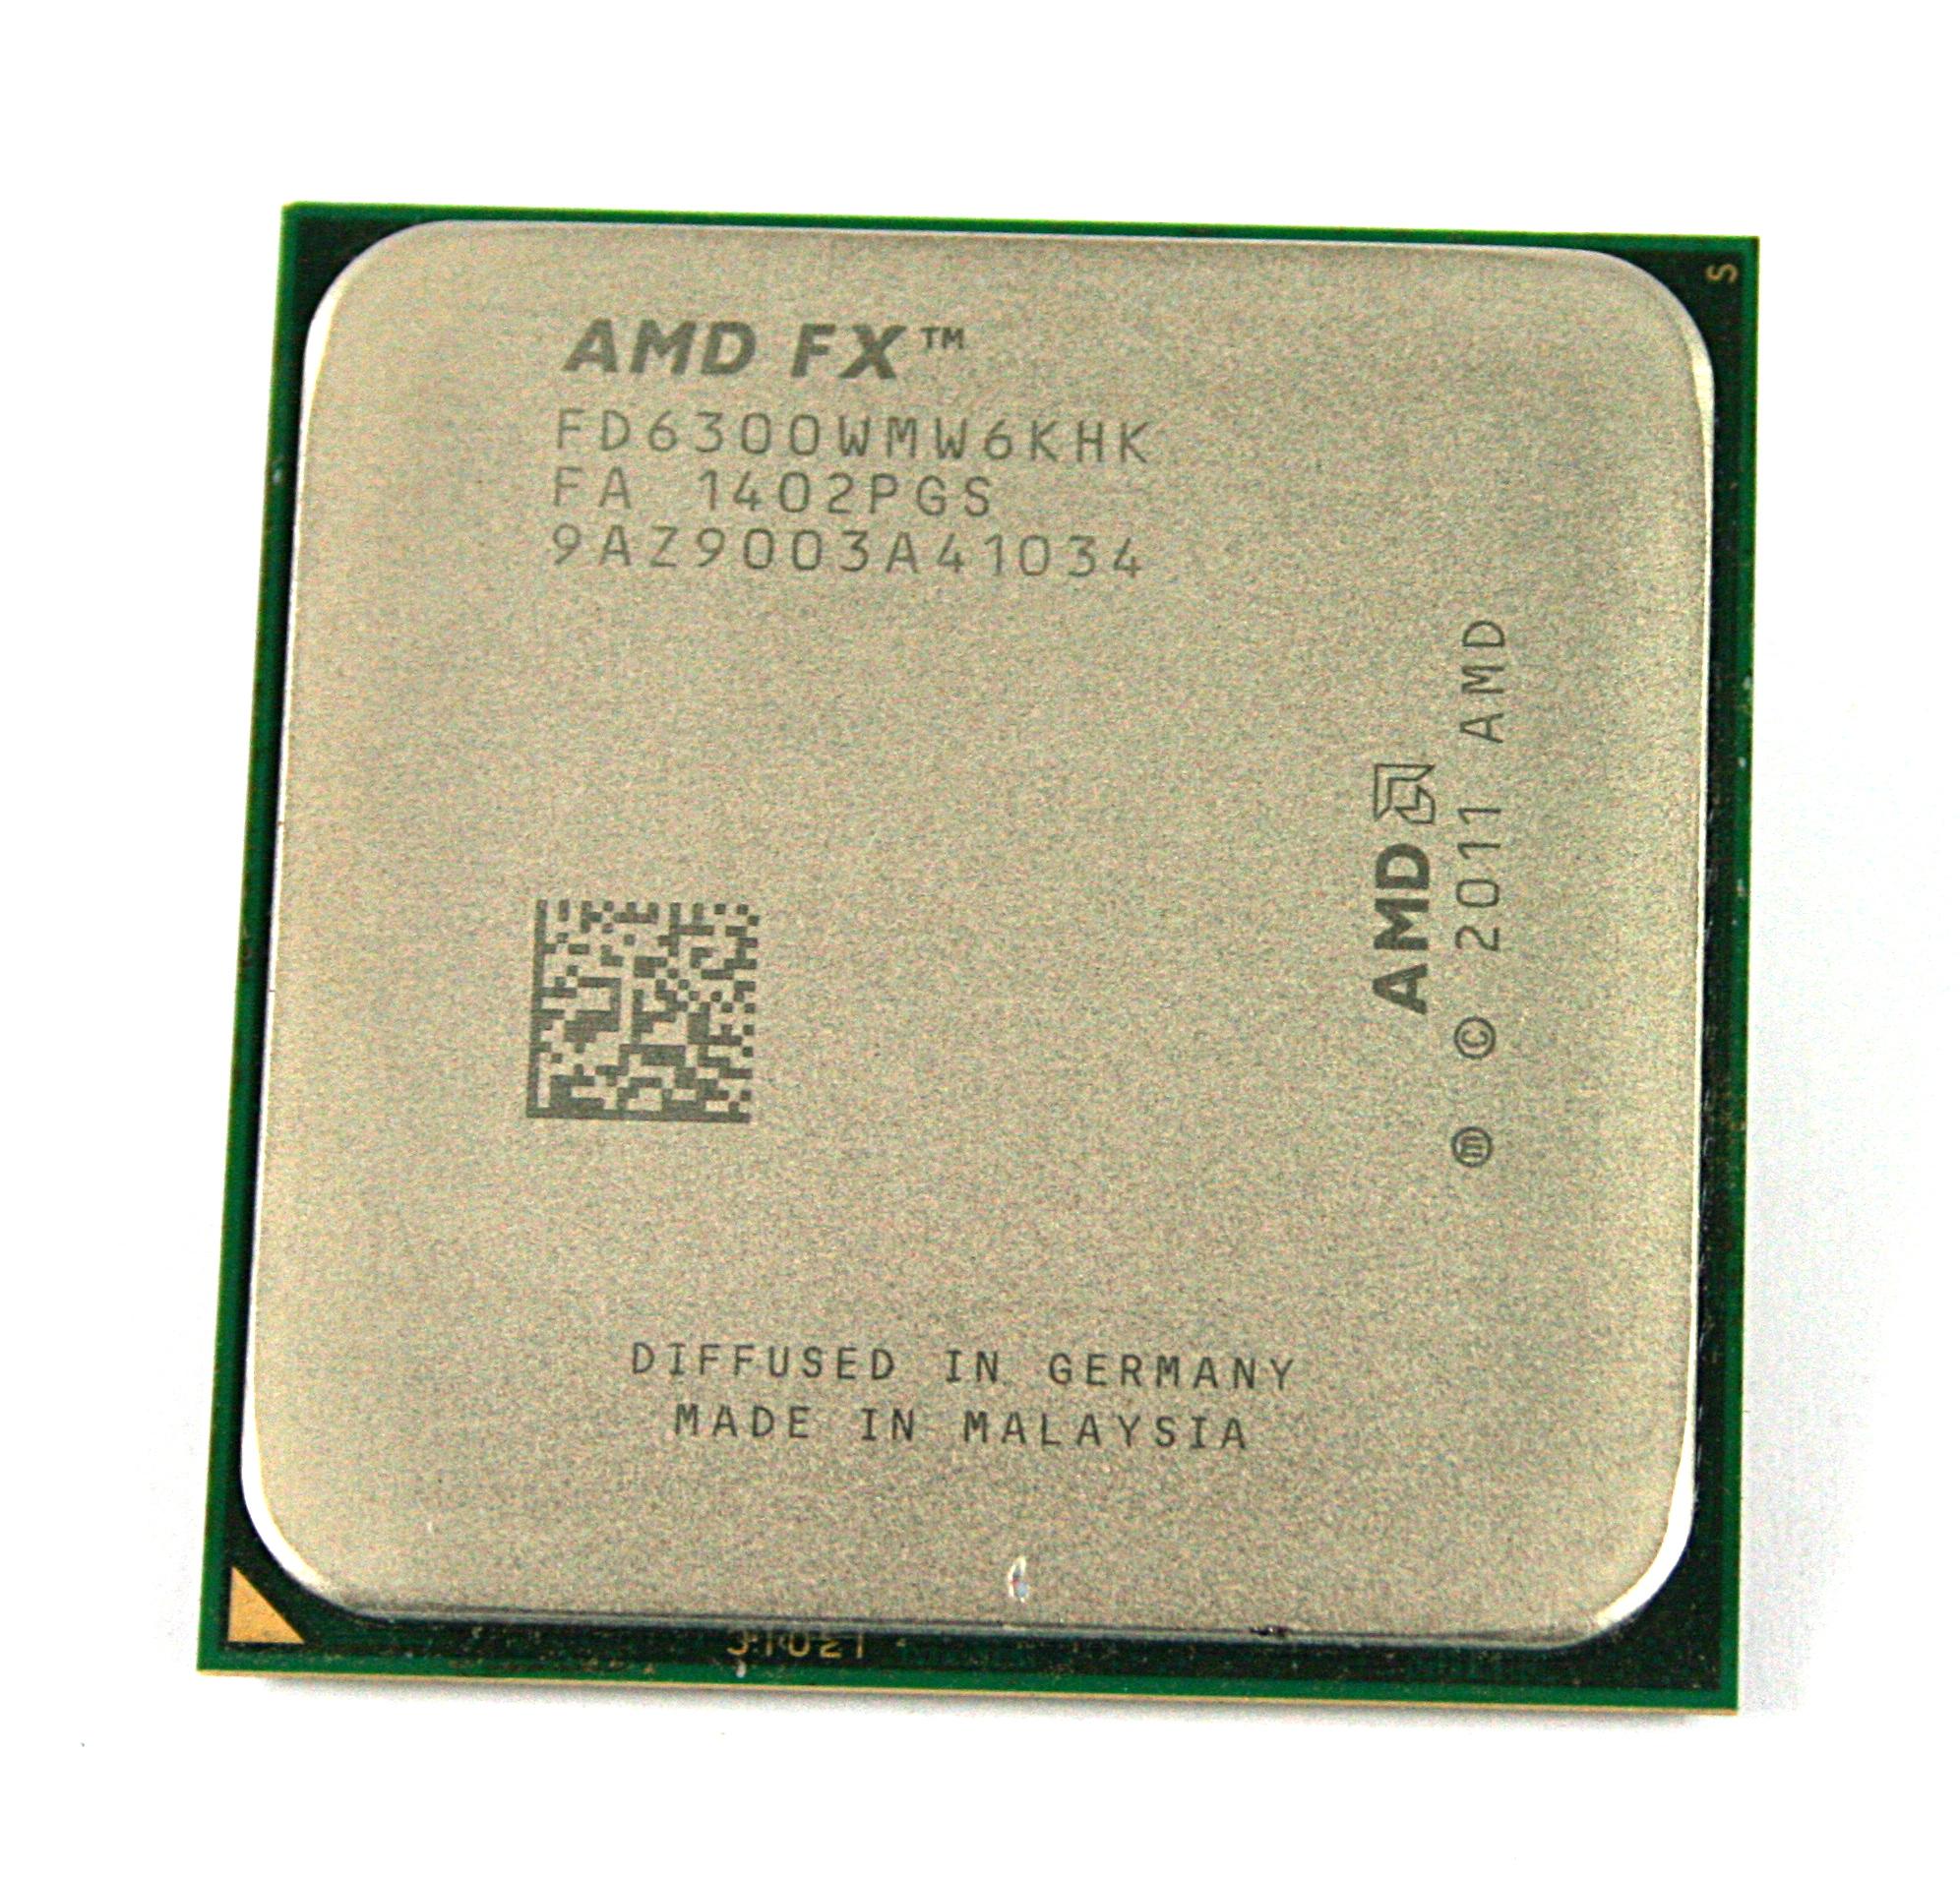 AMD FD6300WMW6KHK FX-6300 3.5GHz Six-Core CPU / Processor